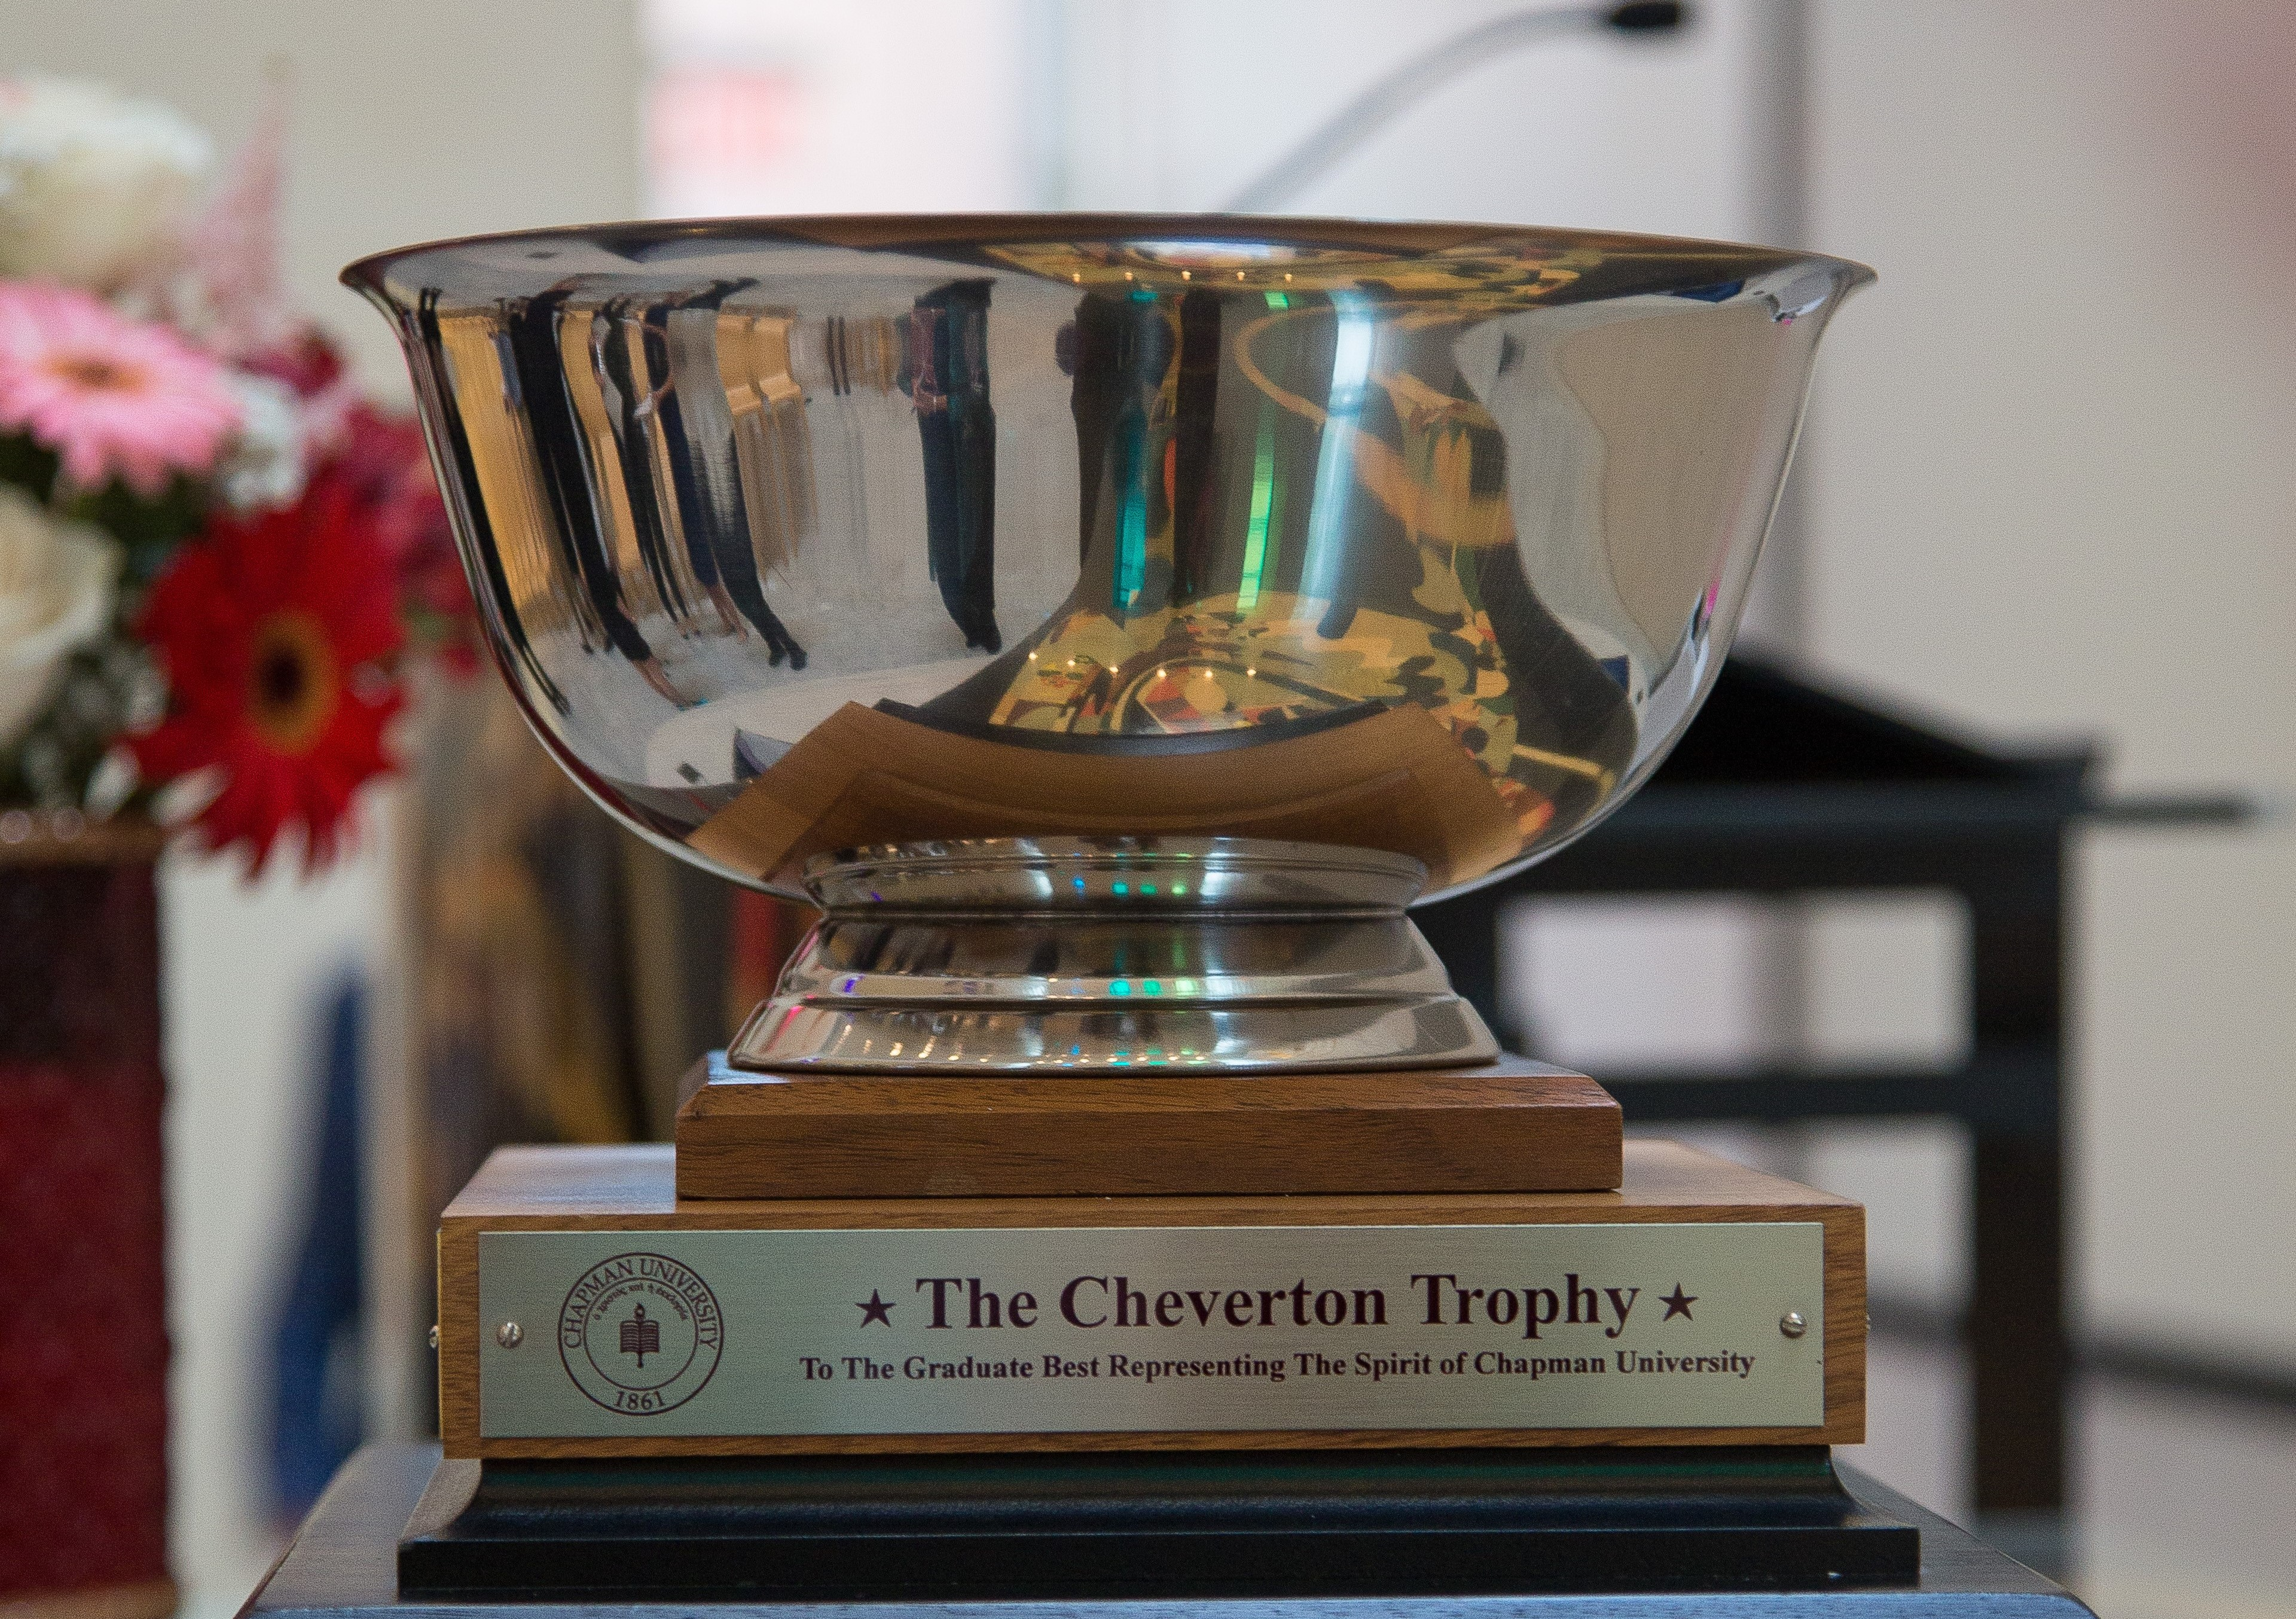 Cheverton Award trophy